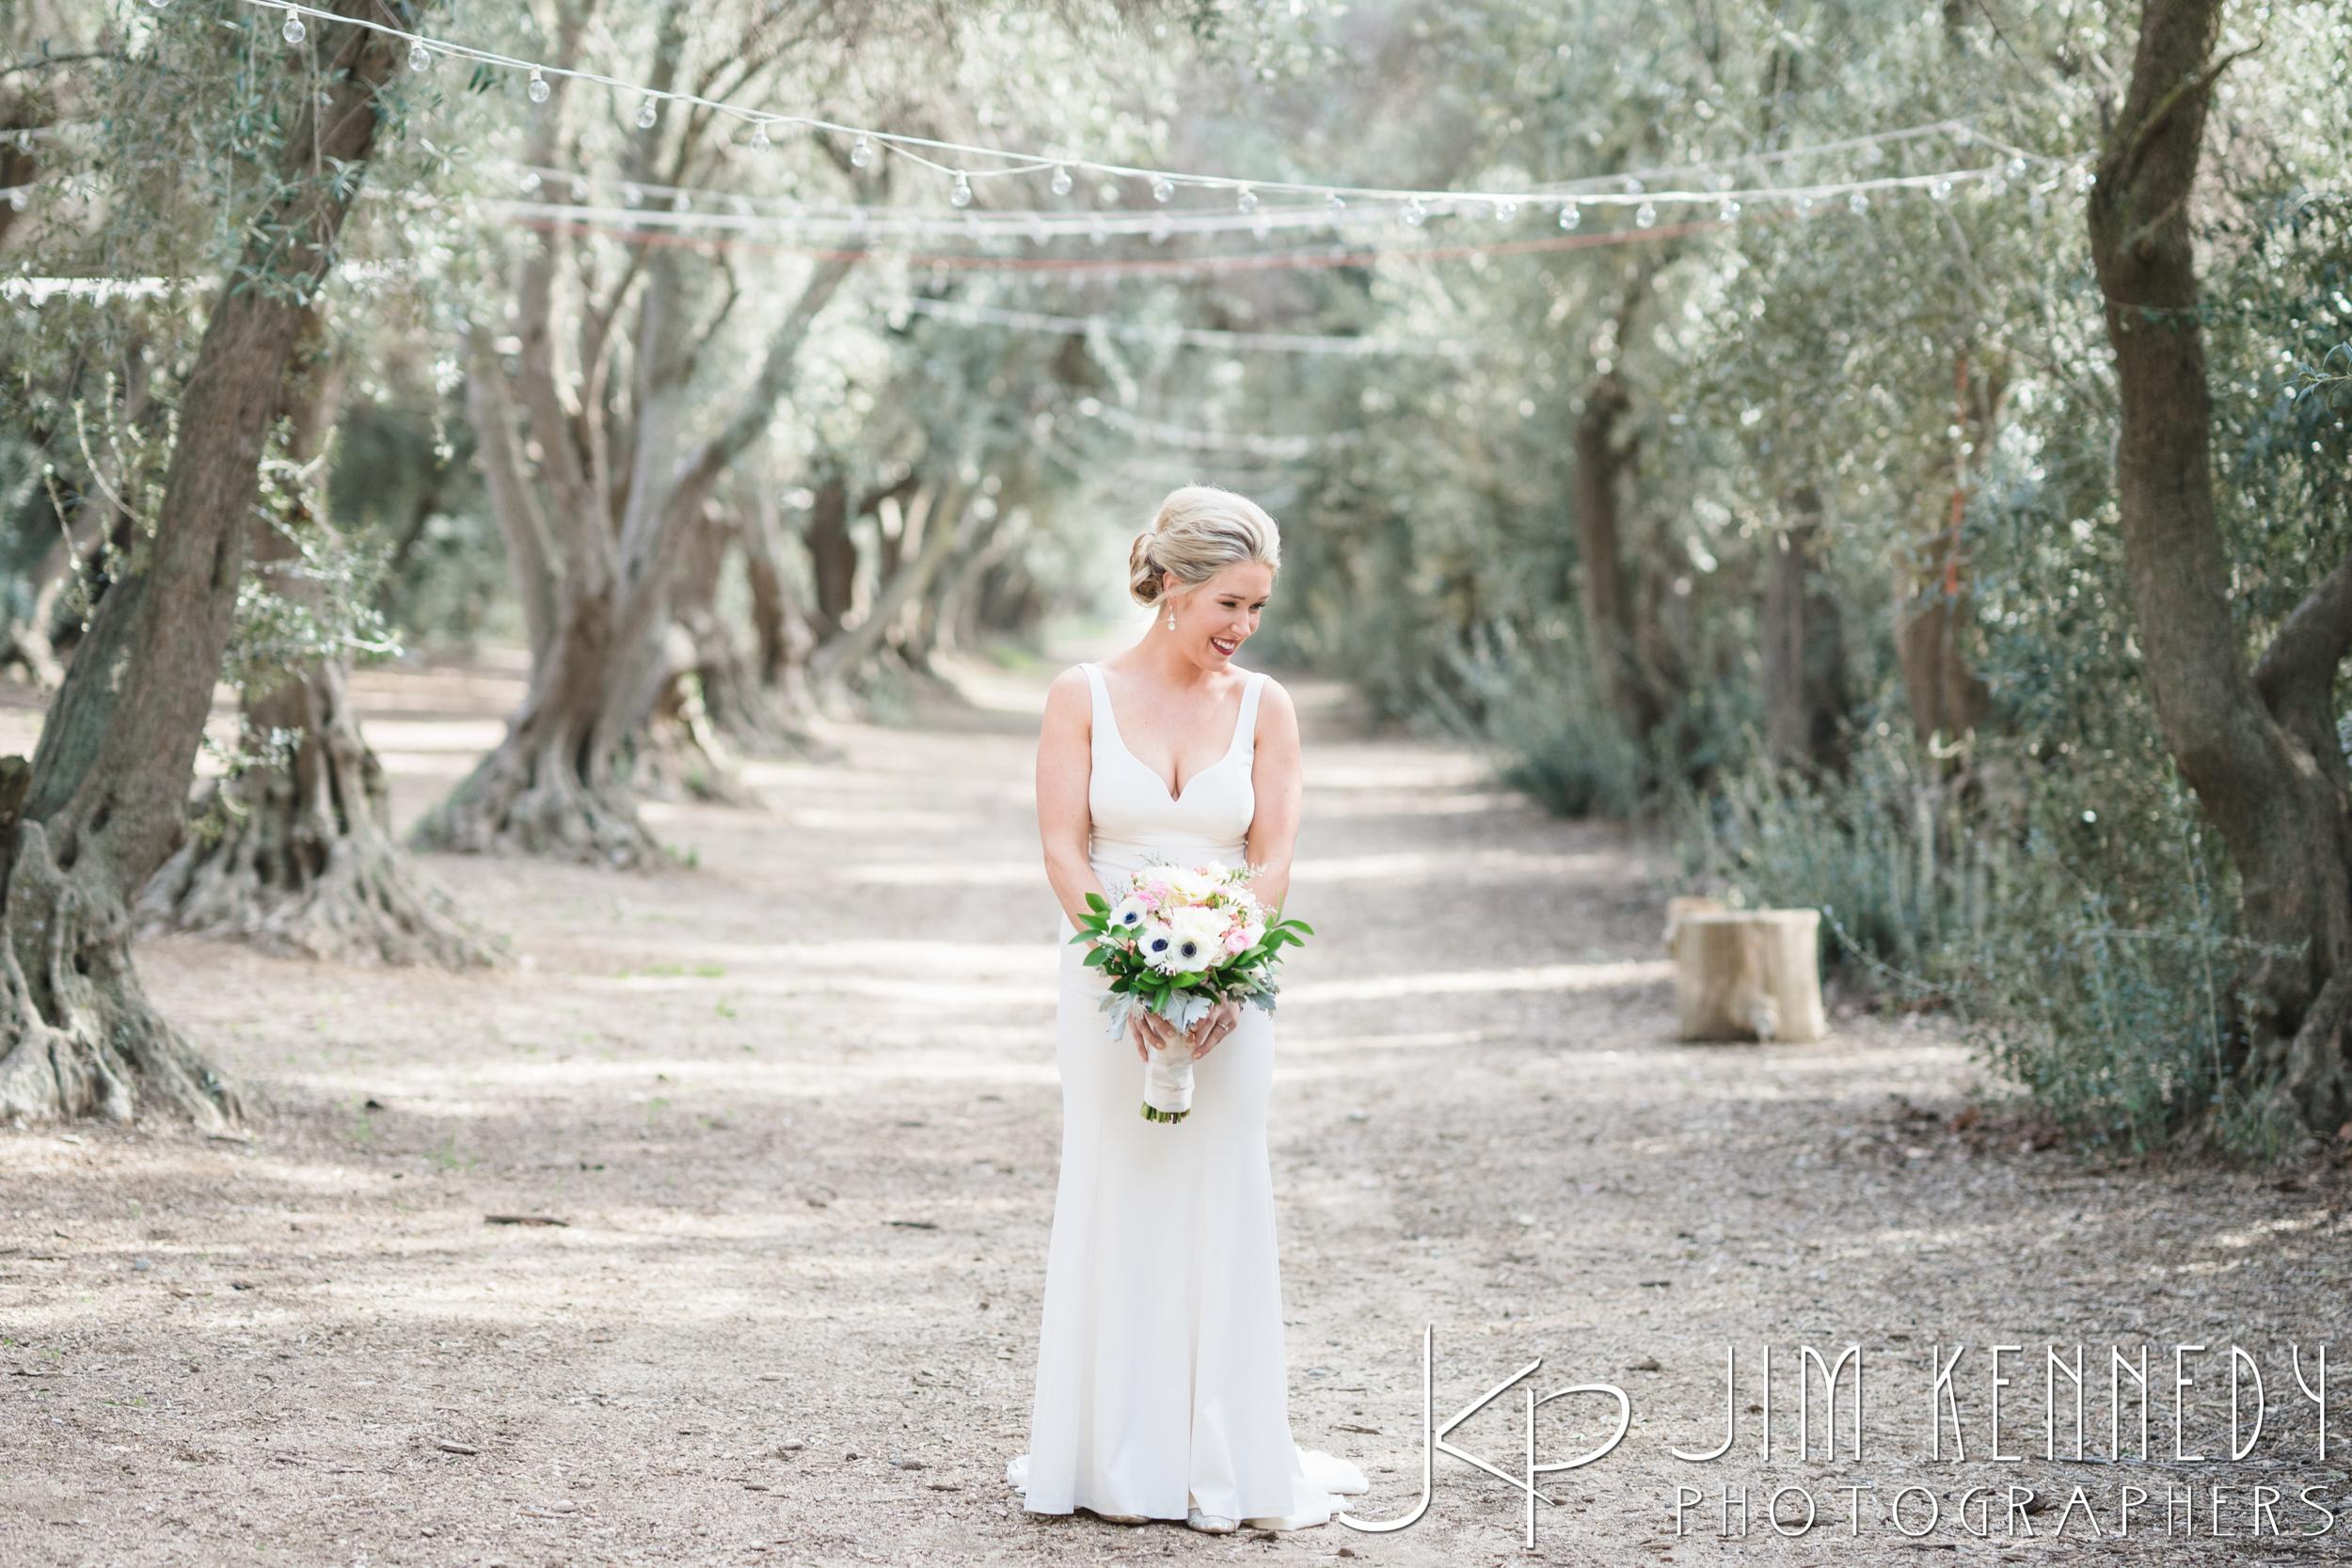 jim_kennedy_photographers_highland_springs_wedding_caitlyn_0057.jpg